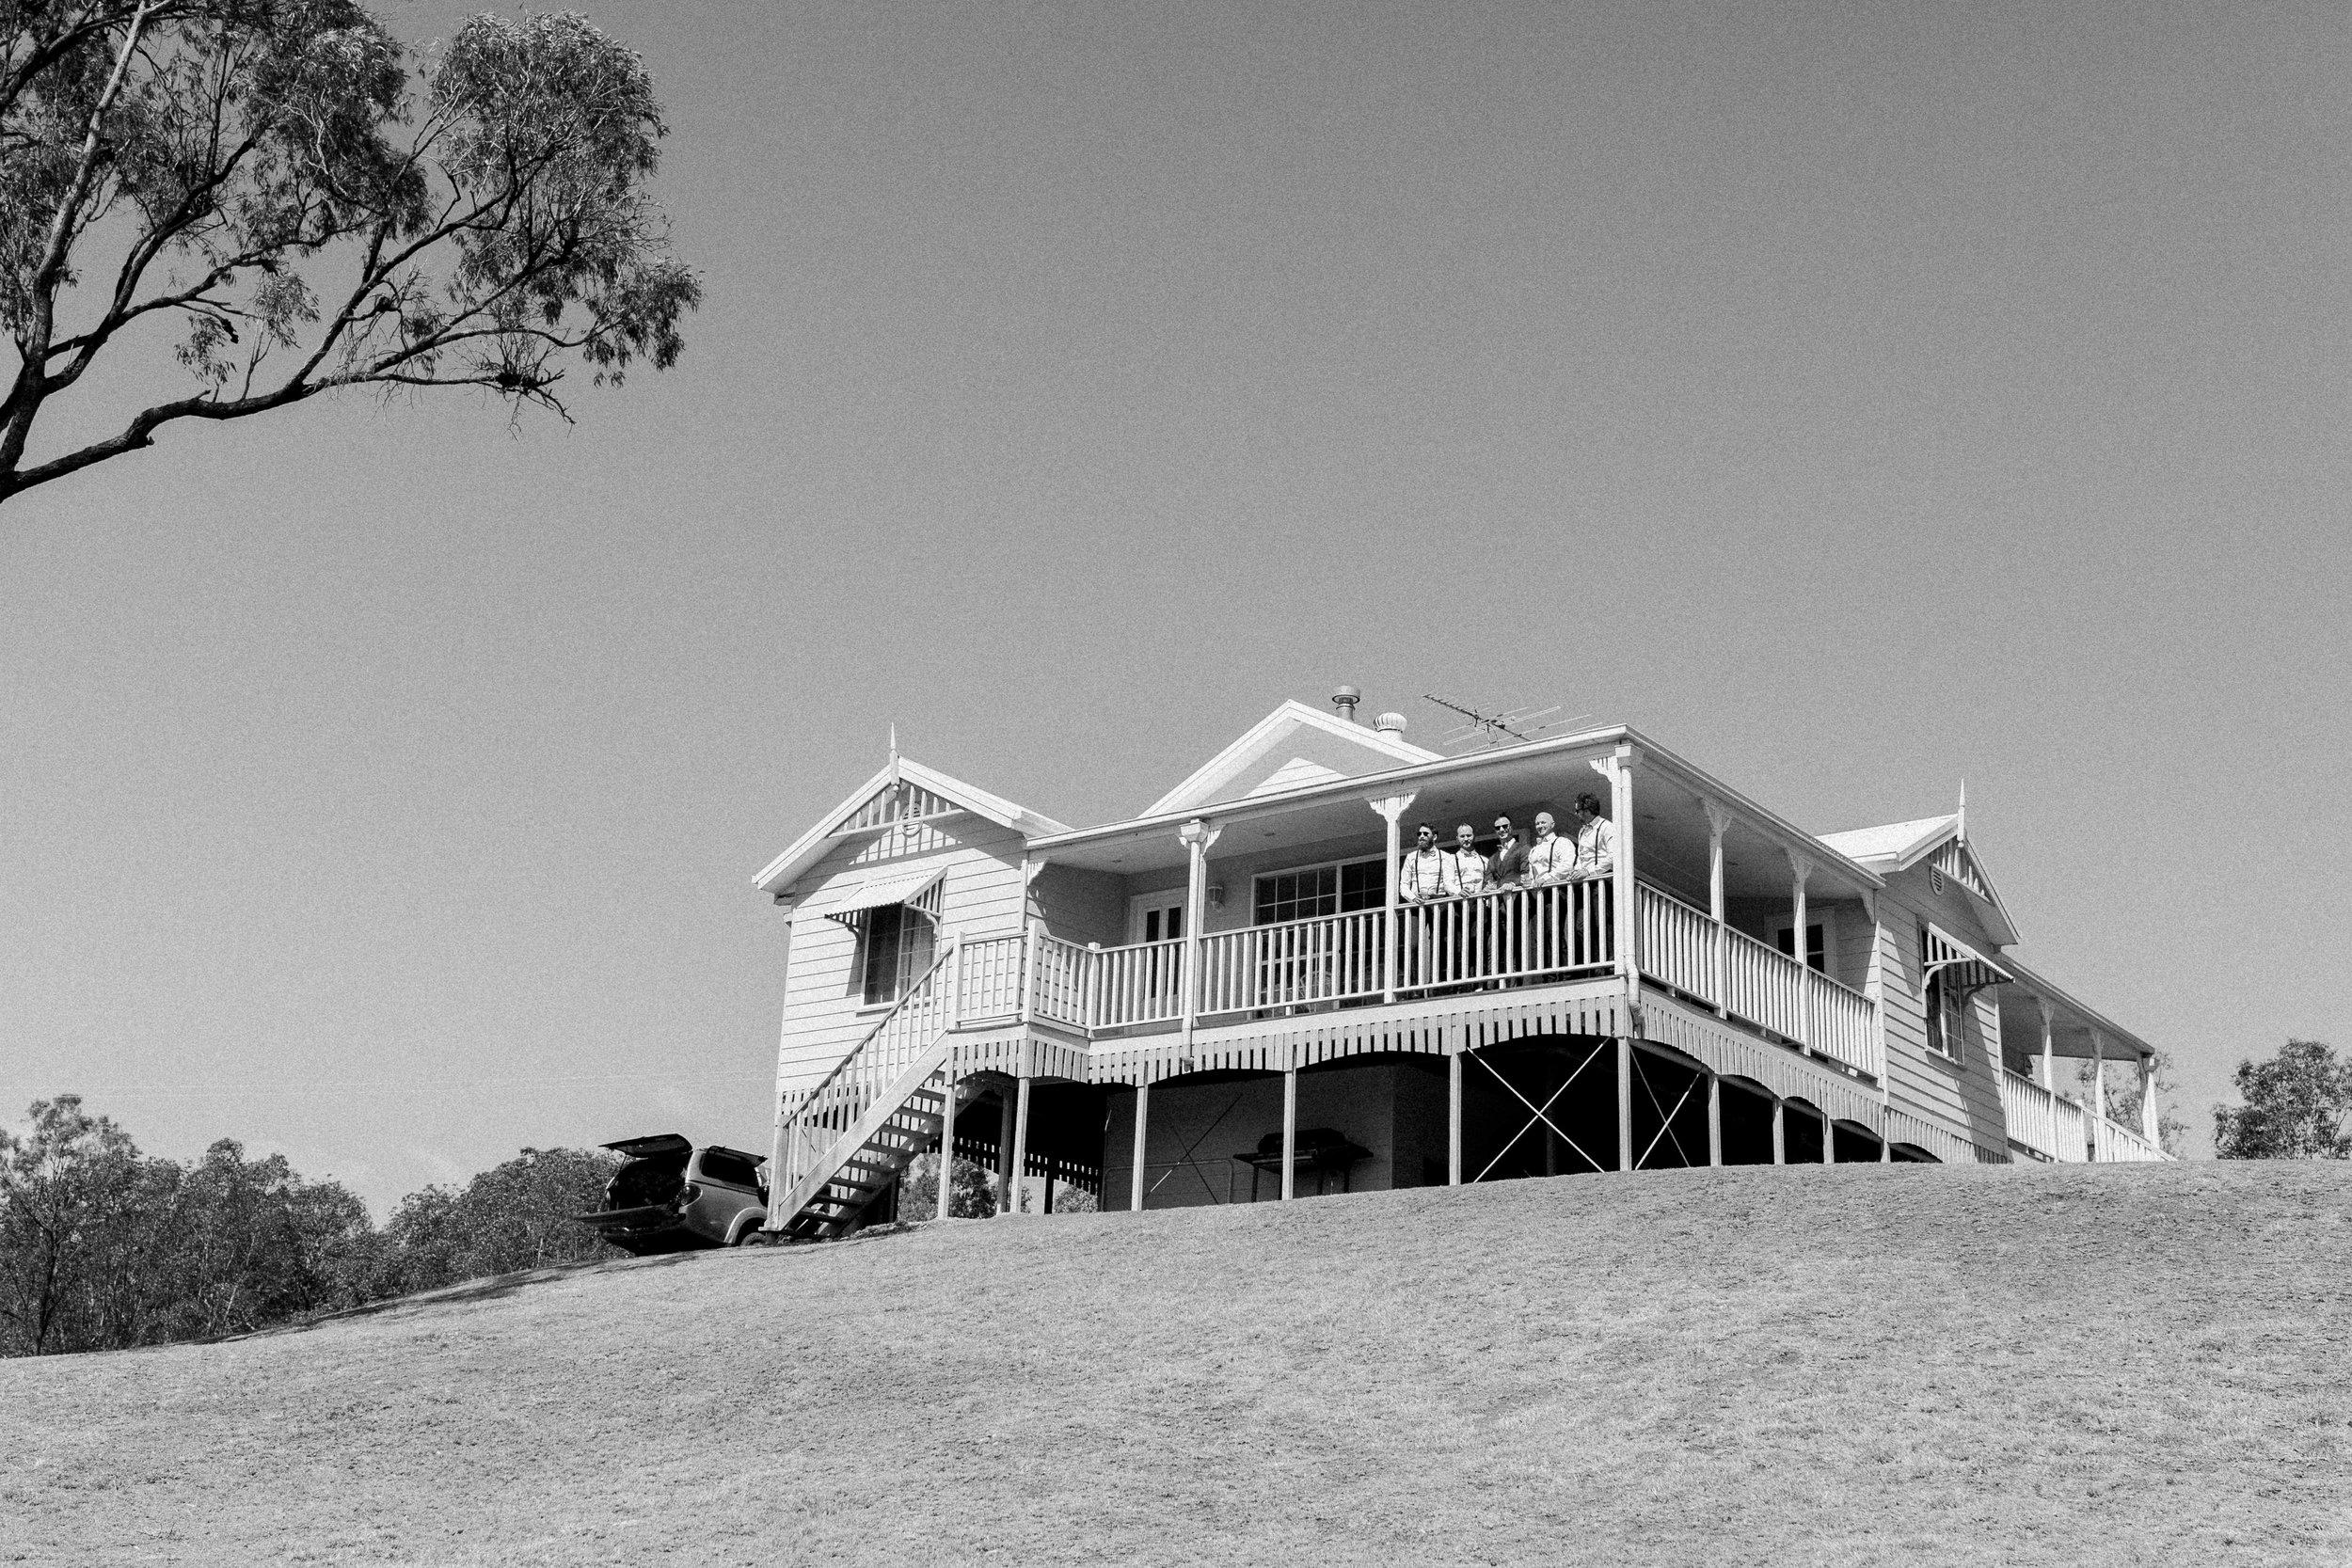 Kooroomba-Vineyard-Lavender-Farm-Wedding-Fine-Art-Lauren-Olivia-29.jpg